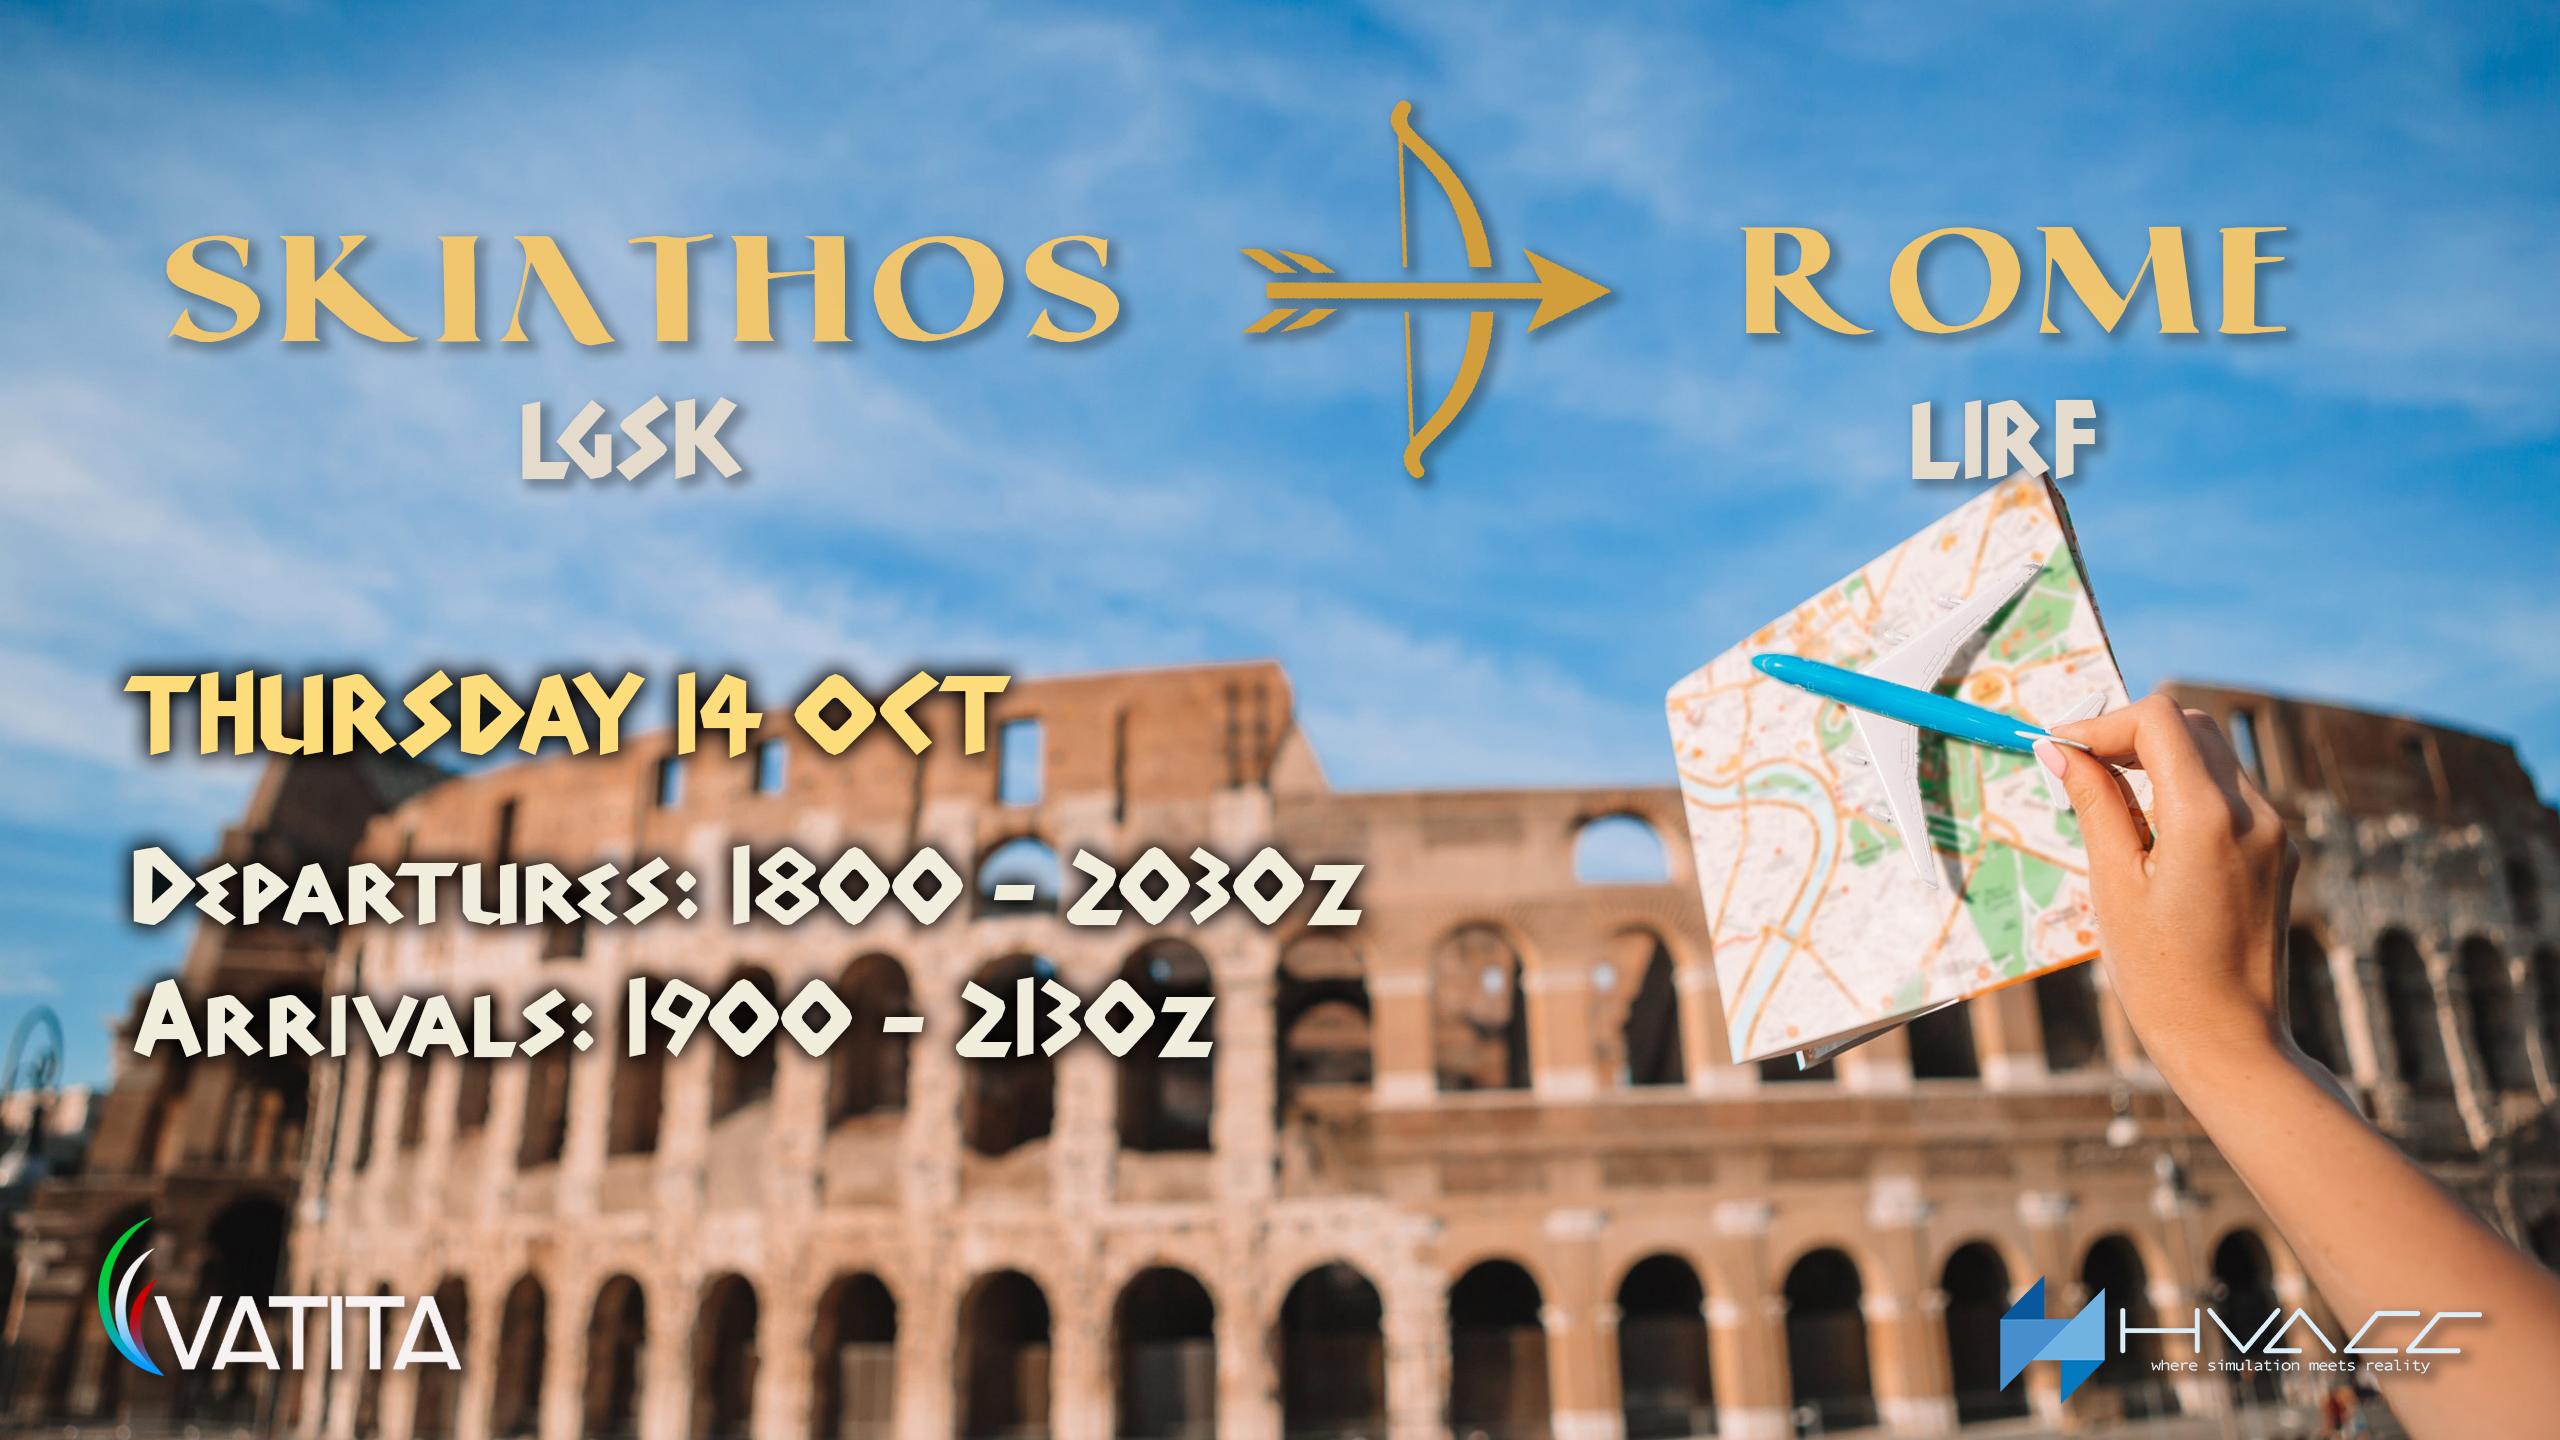 Skiathos Rome CityLink - Virtual Norwegian Events